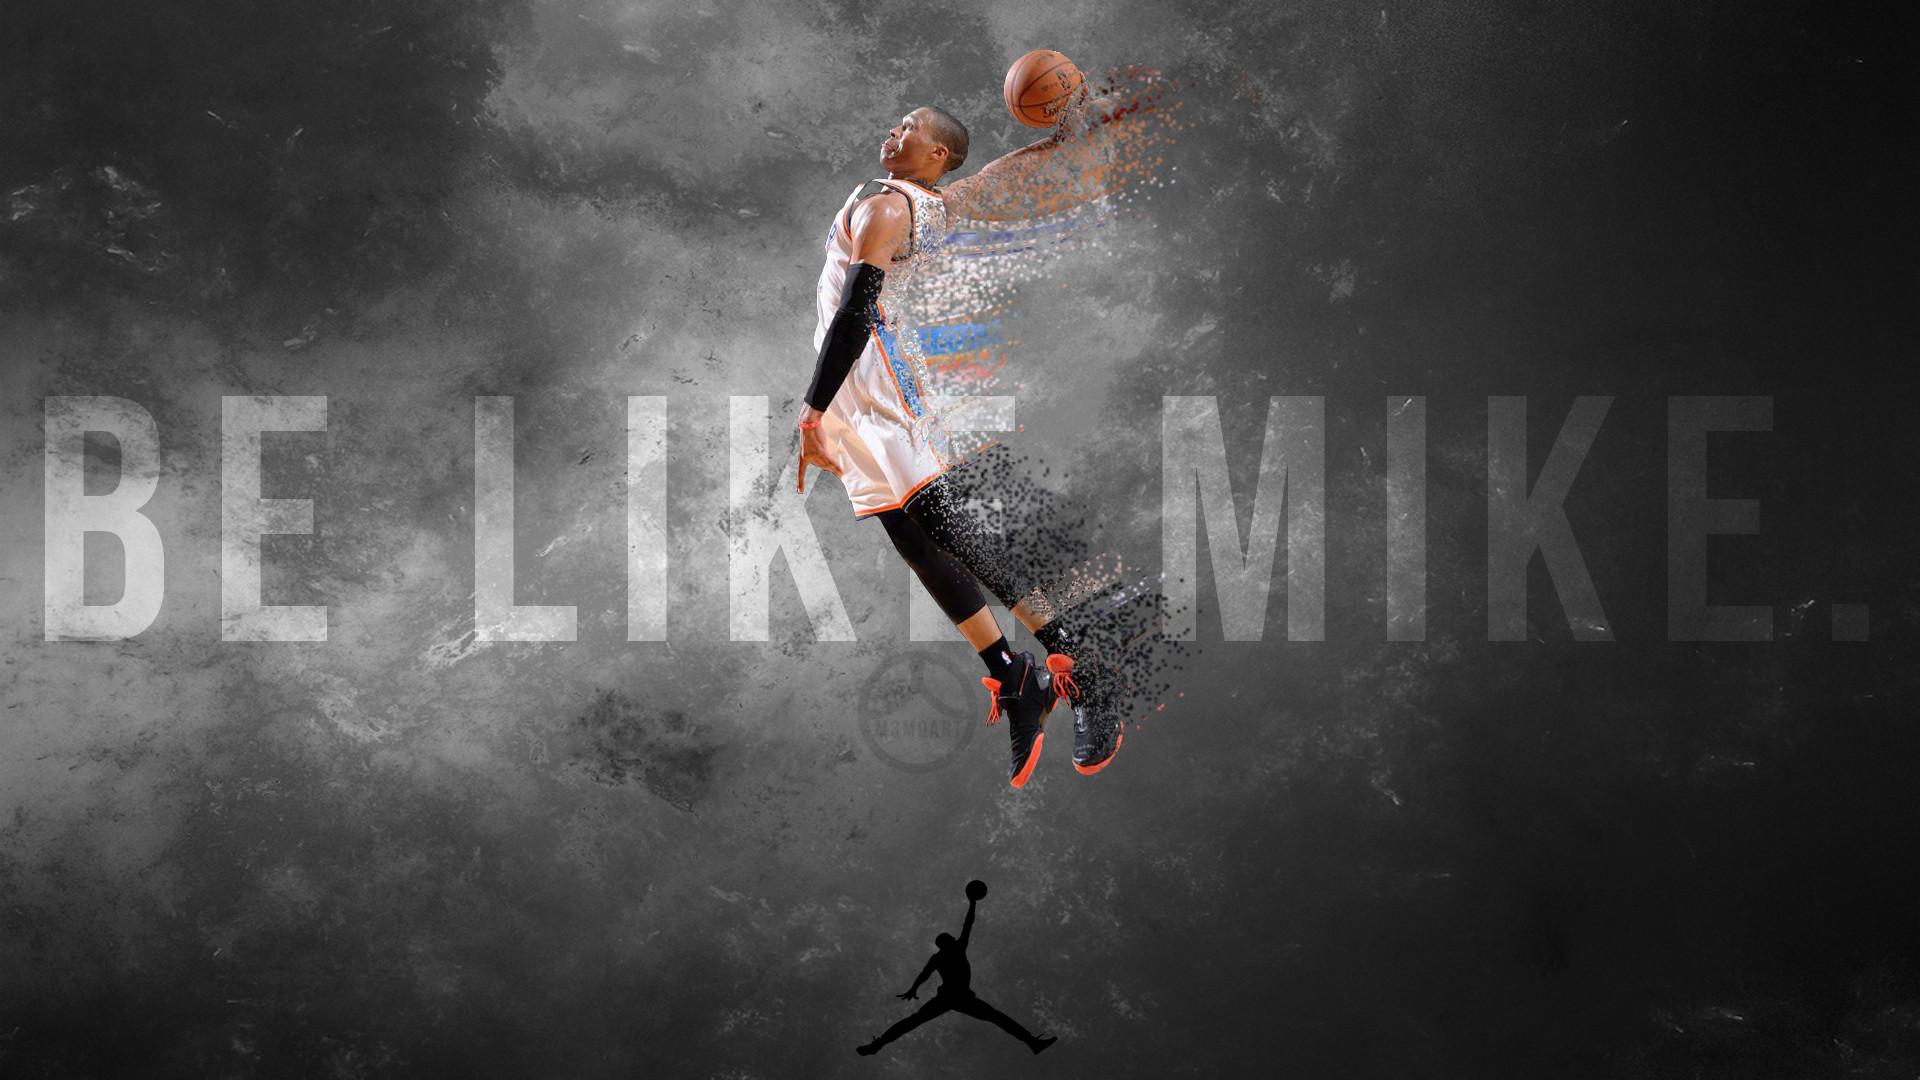 Russell Westbrook Dunk Wallpaper | Oklahoma City Thunder 2013 .